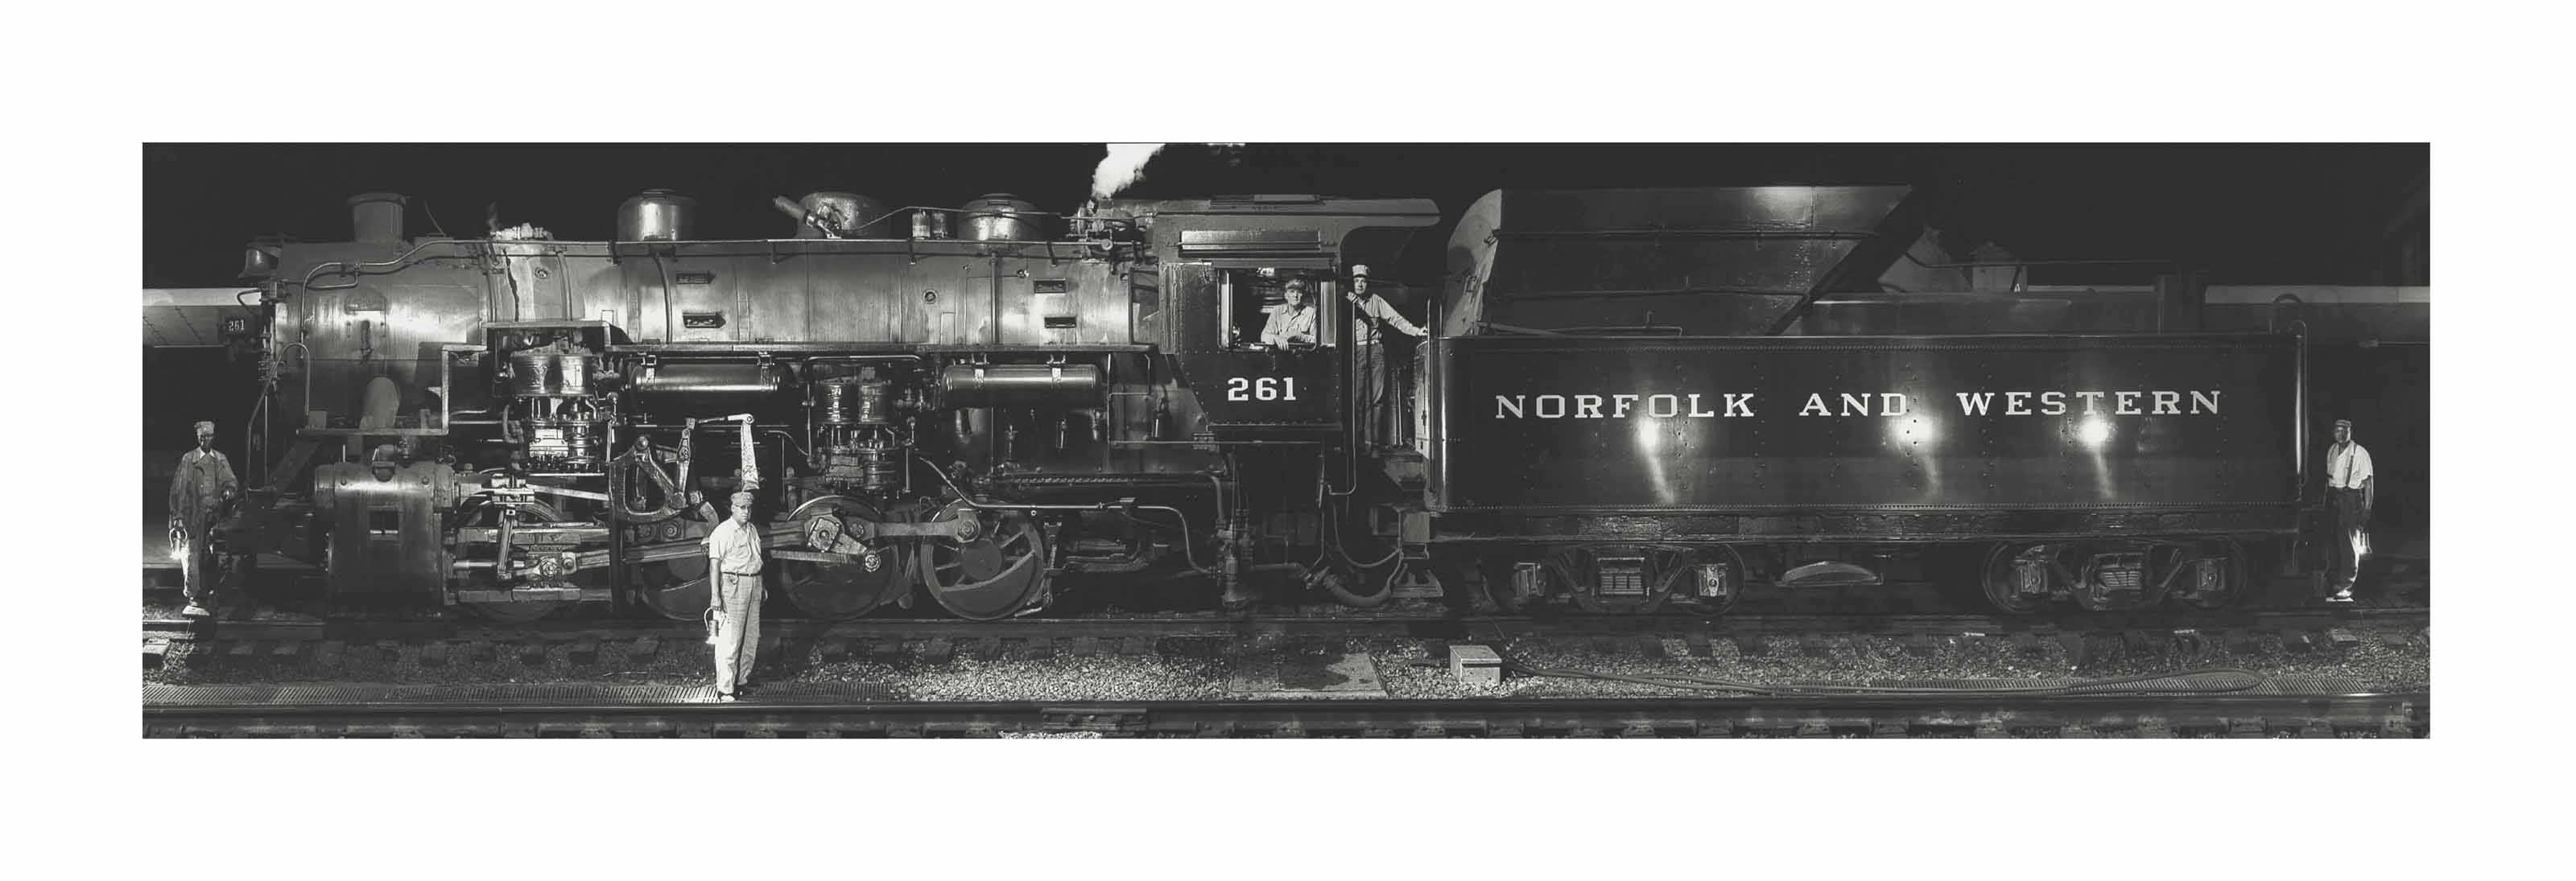 Norfolk & Western Engine Class, S1a, No. 26, 1958